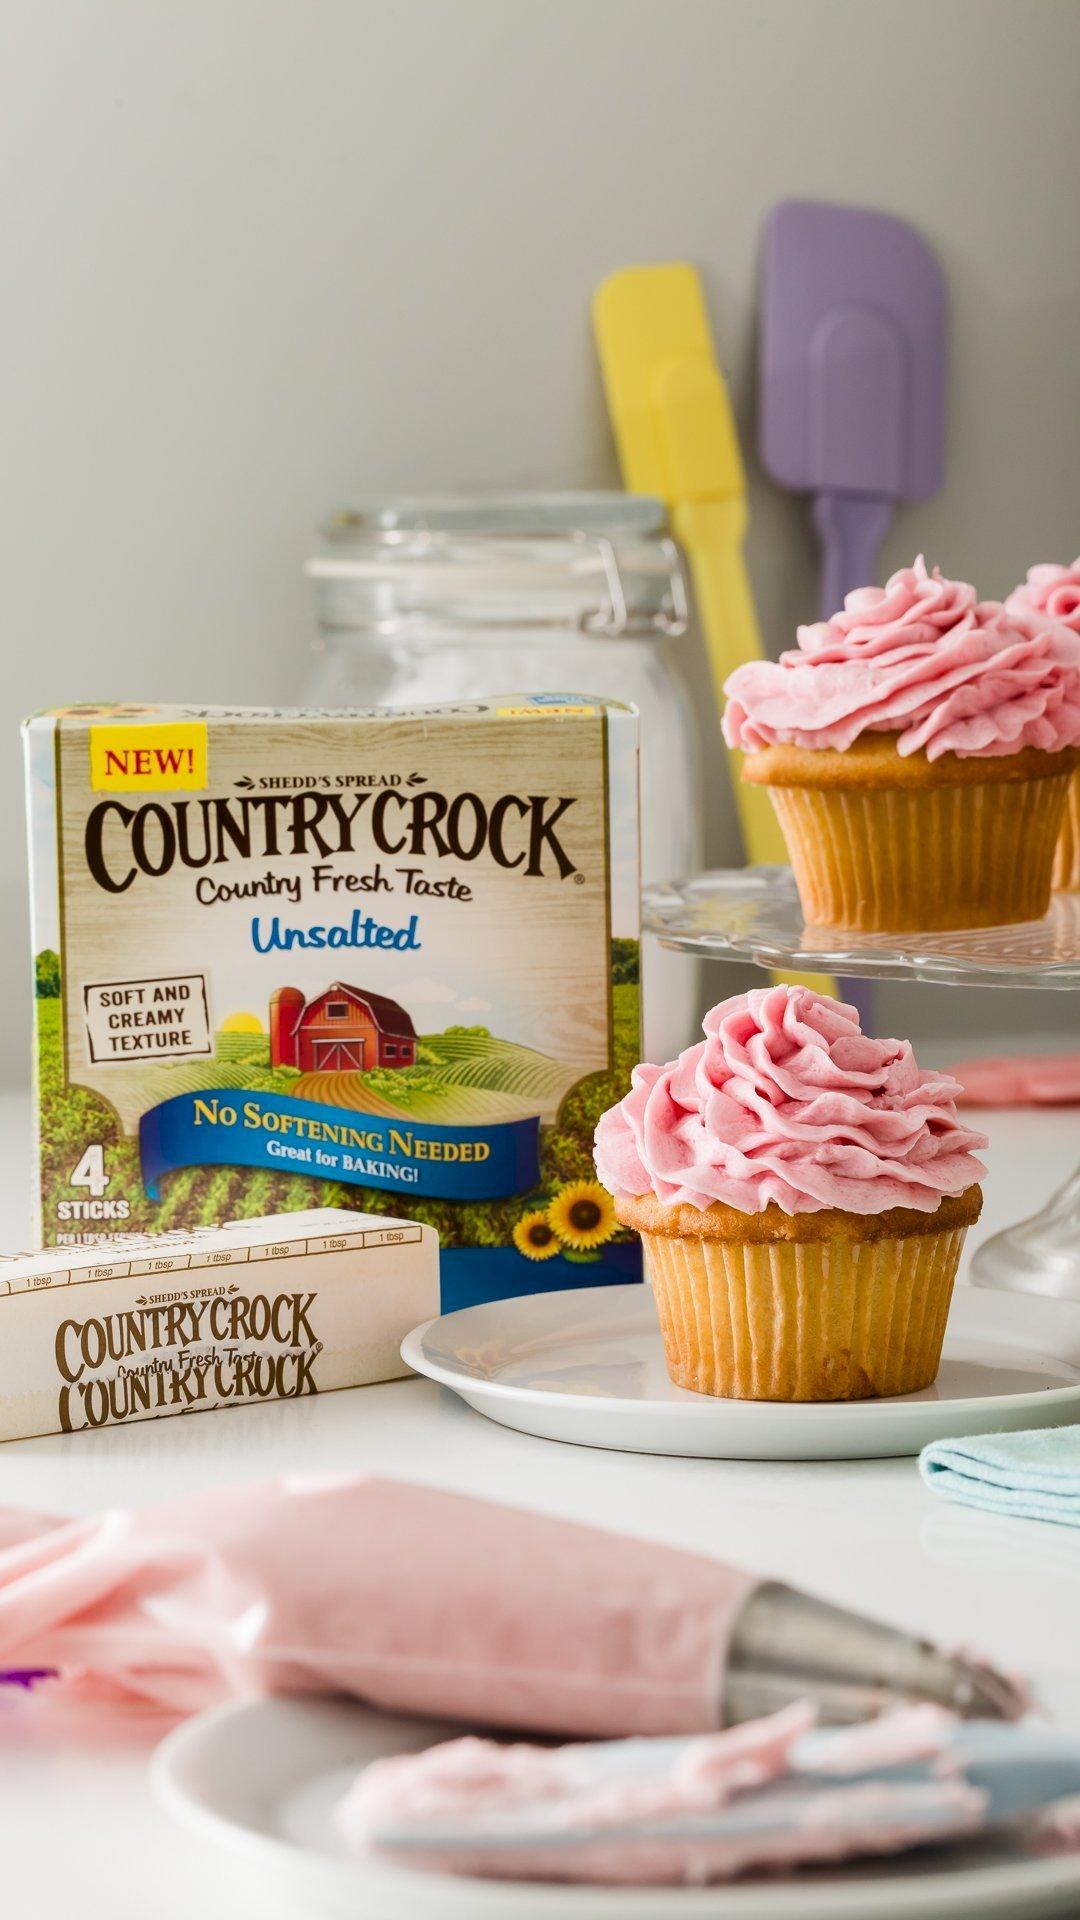 Country Crock Buttery Sticks